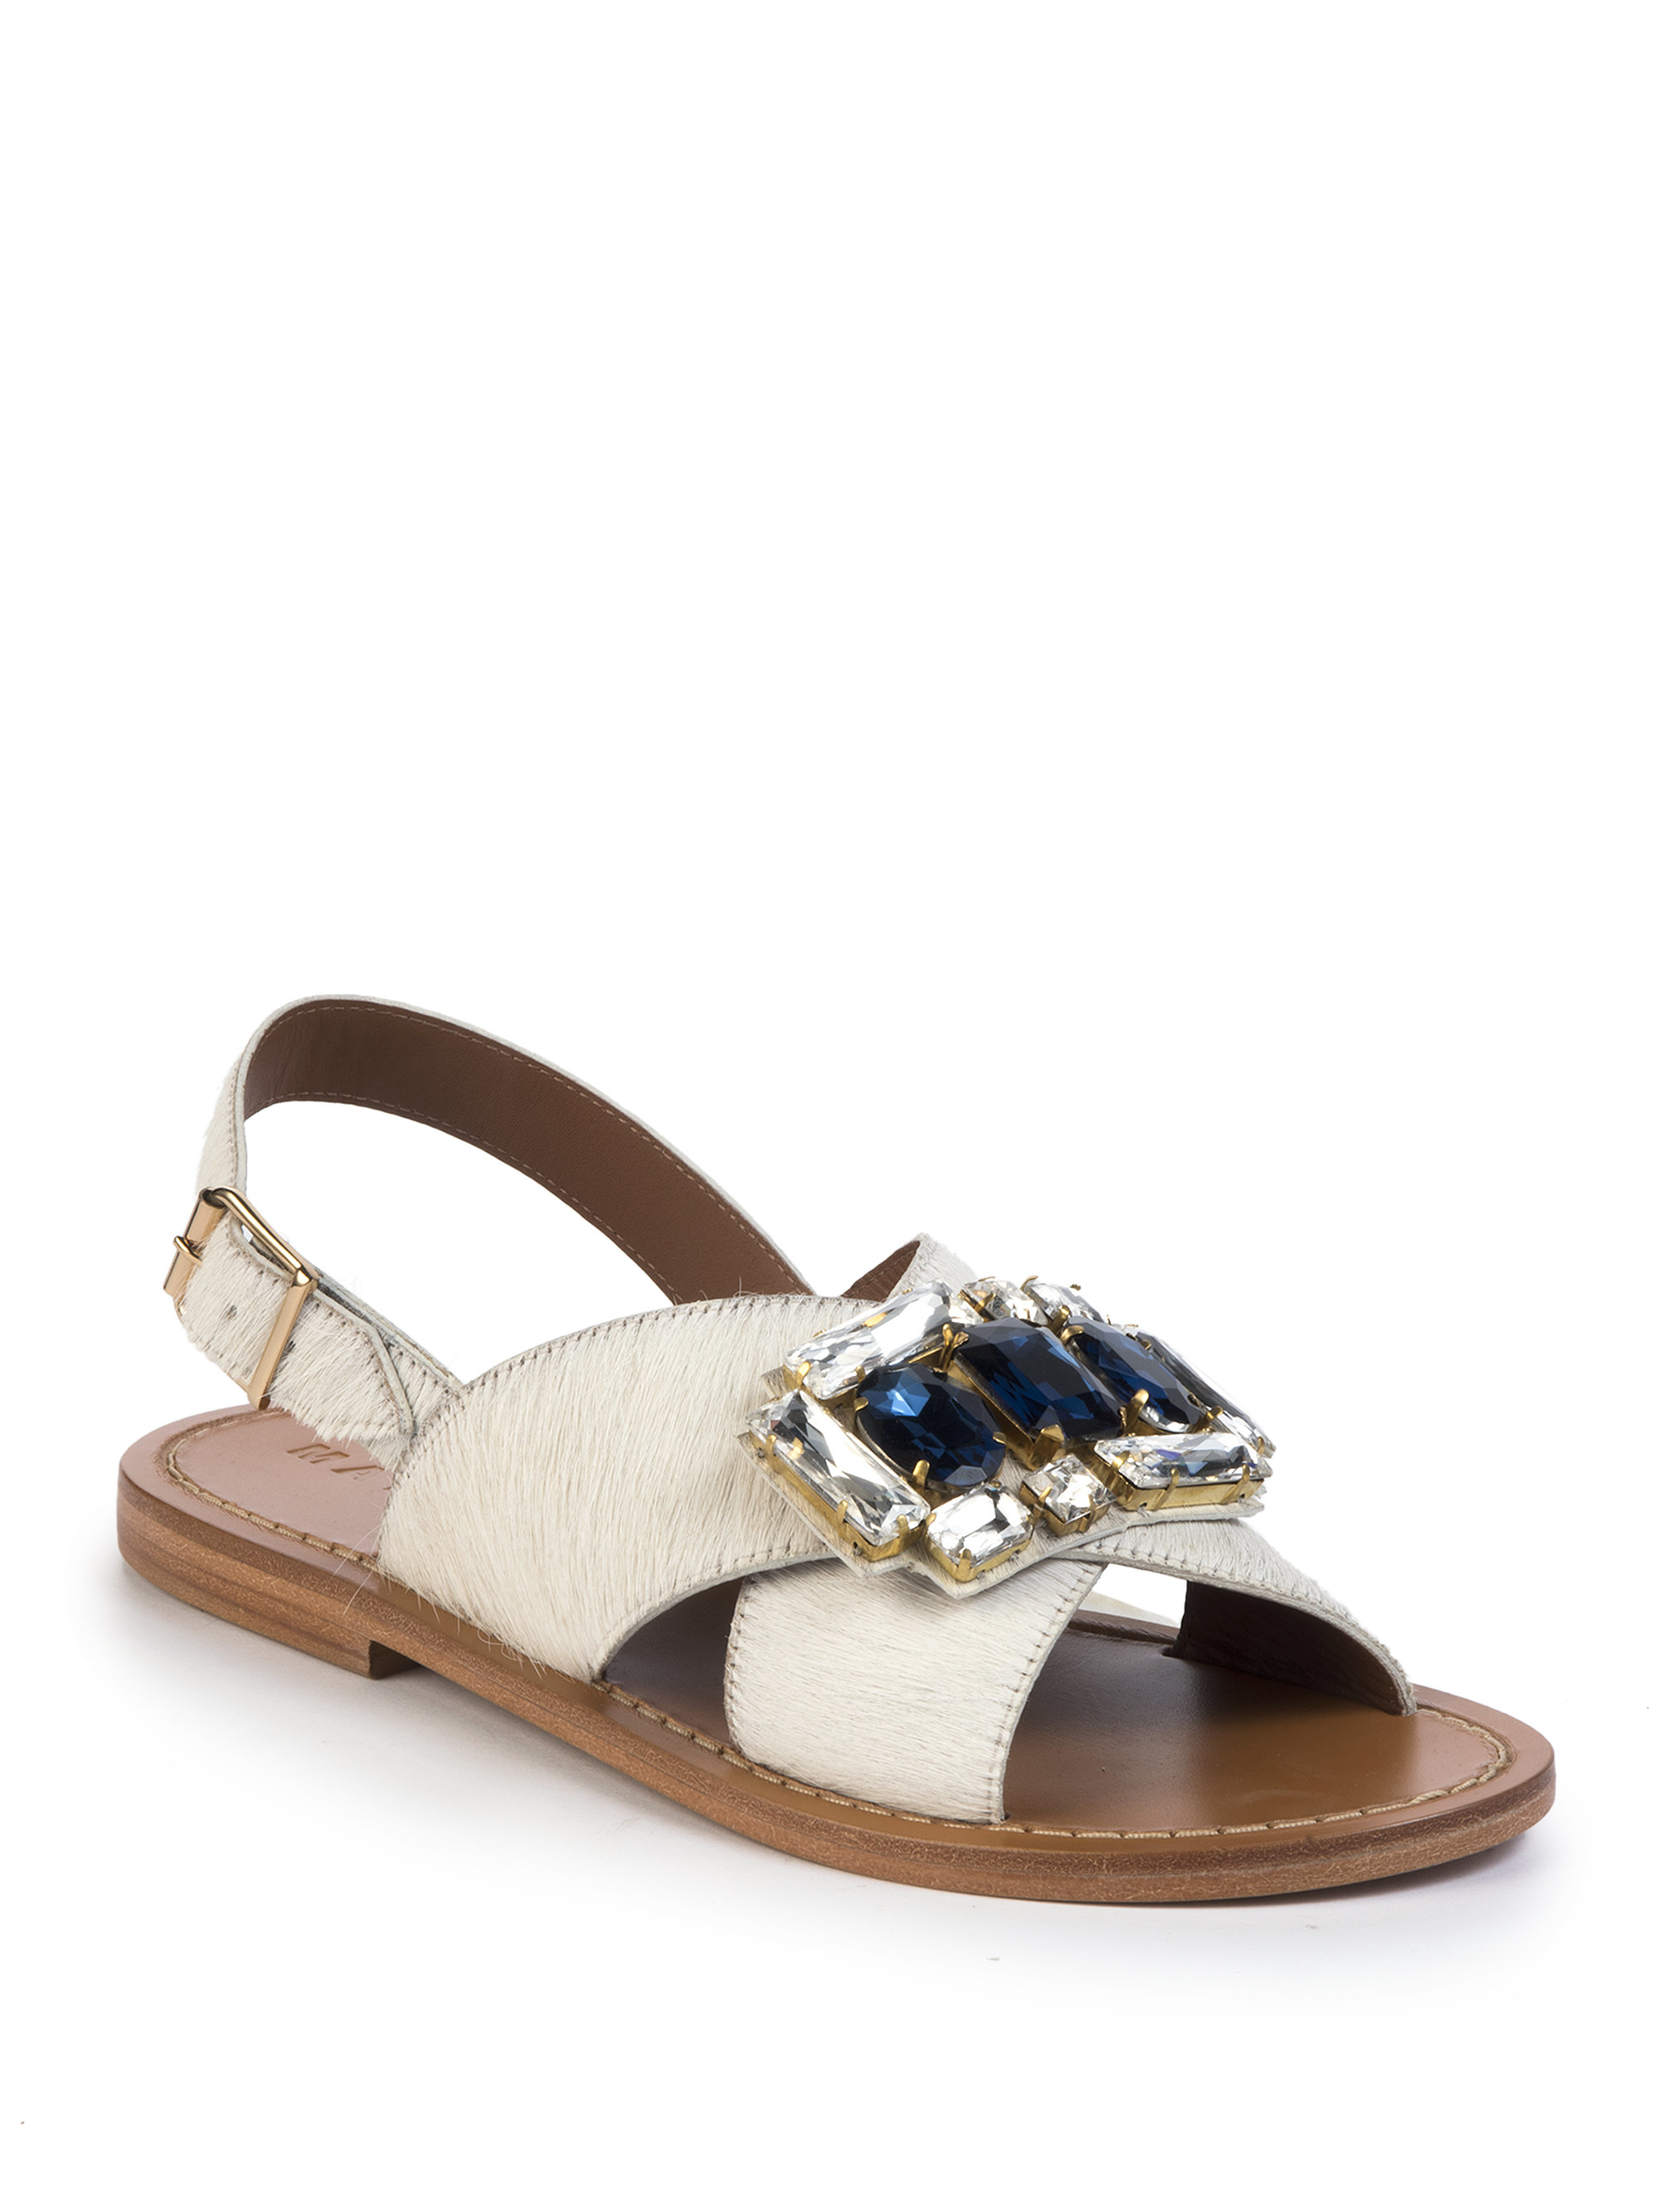 cd63ed1c8 Lyst - Marni Jeweled Calf Hair Crisscross Flat Sandals in White